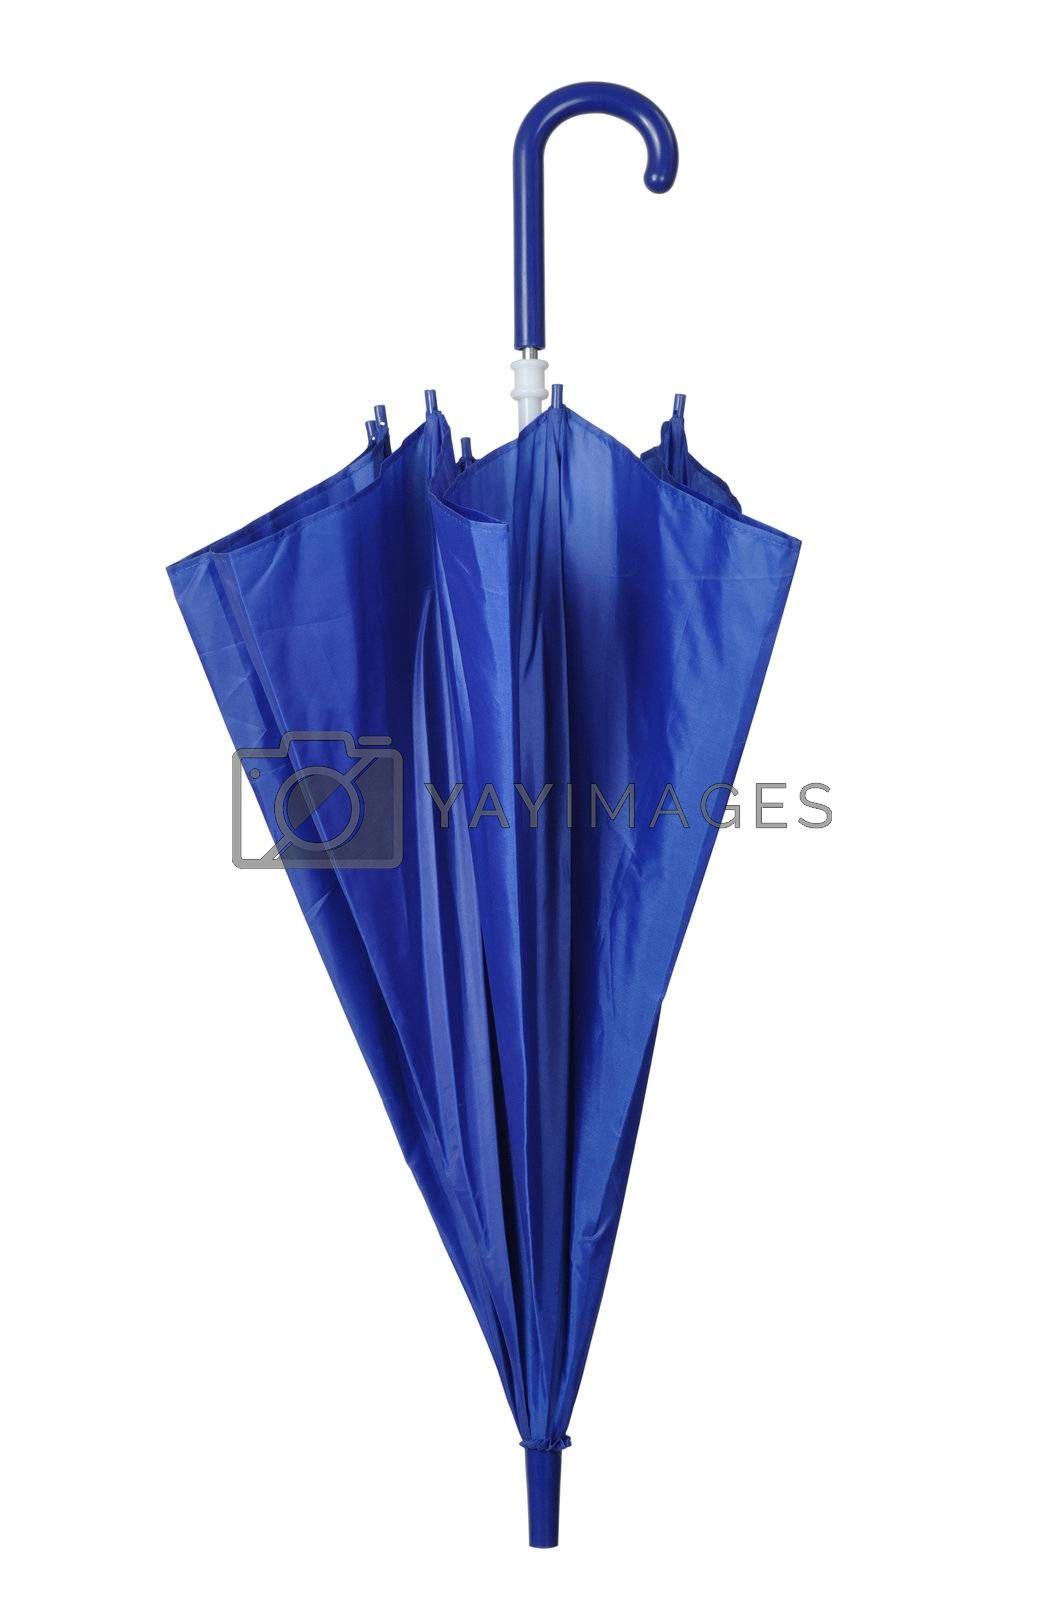 Blue Umbrella by ajt